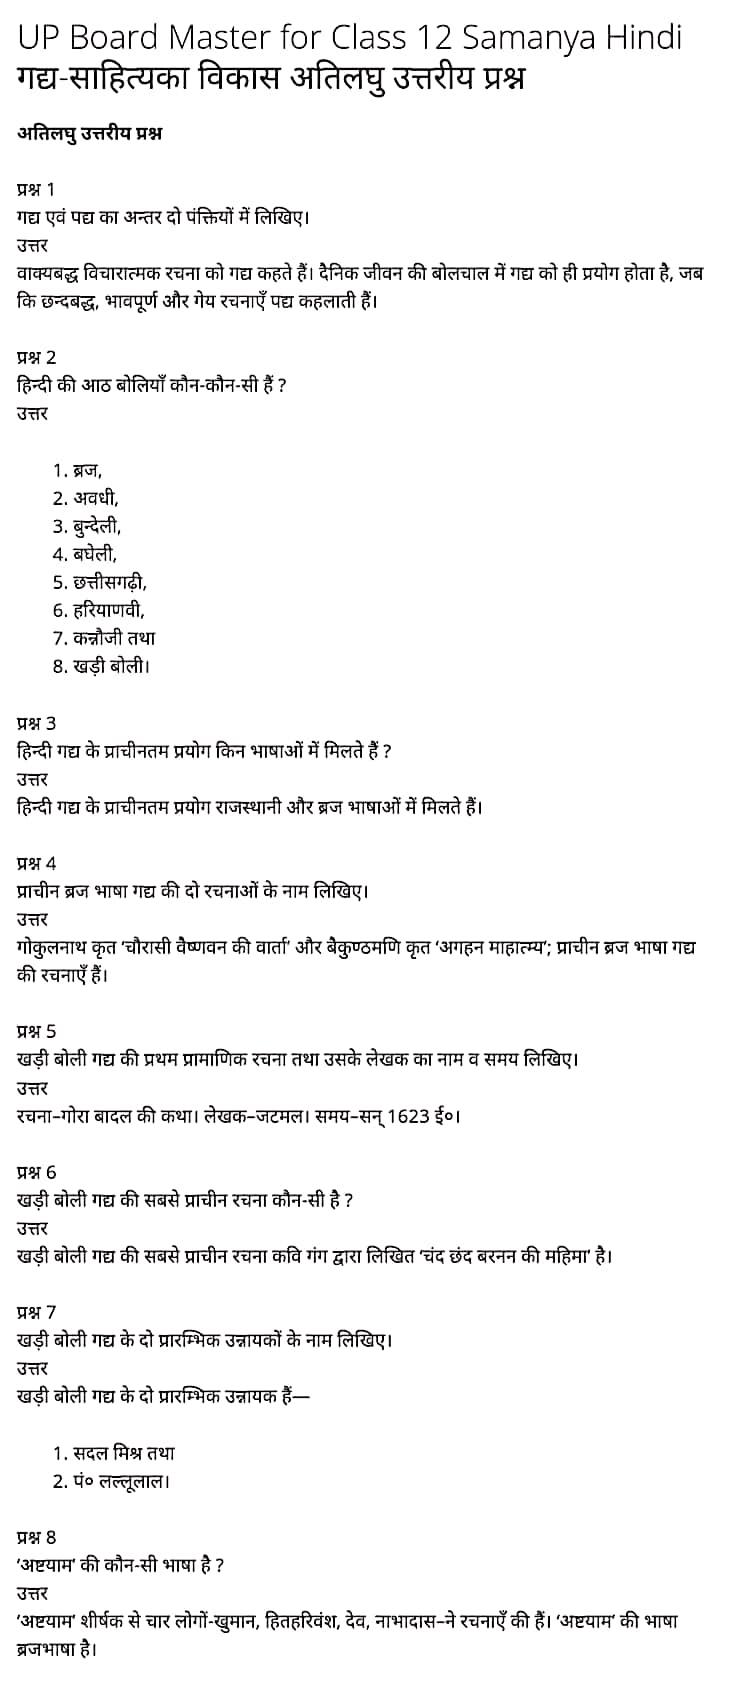 UP Board Solutions for Class 12 Samanya Hindi गद्य-साहित्यका विकास अतिलघु उत्तरीय प्रश्न